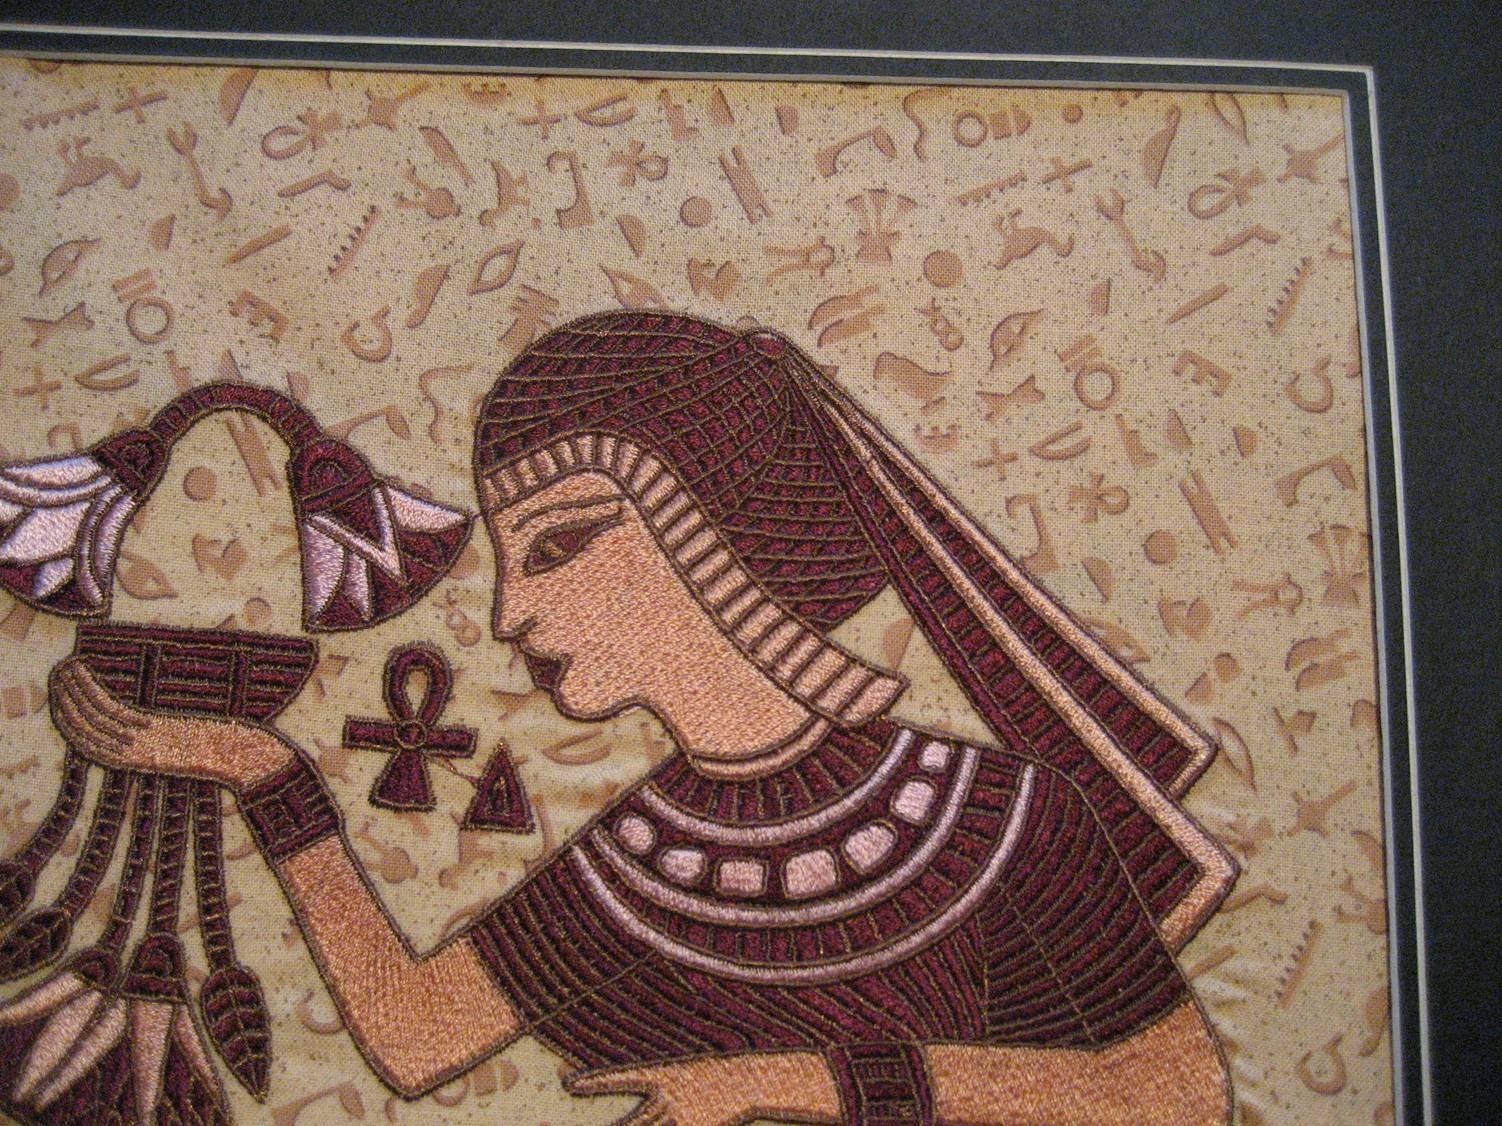 Nefertiti embroidery design by Orfeus